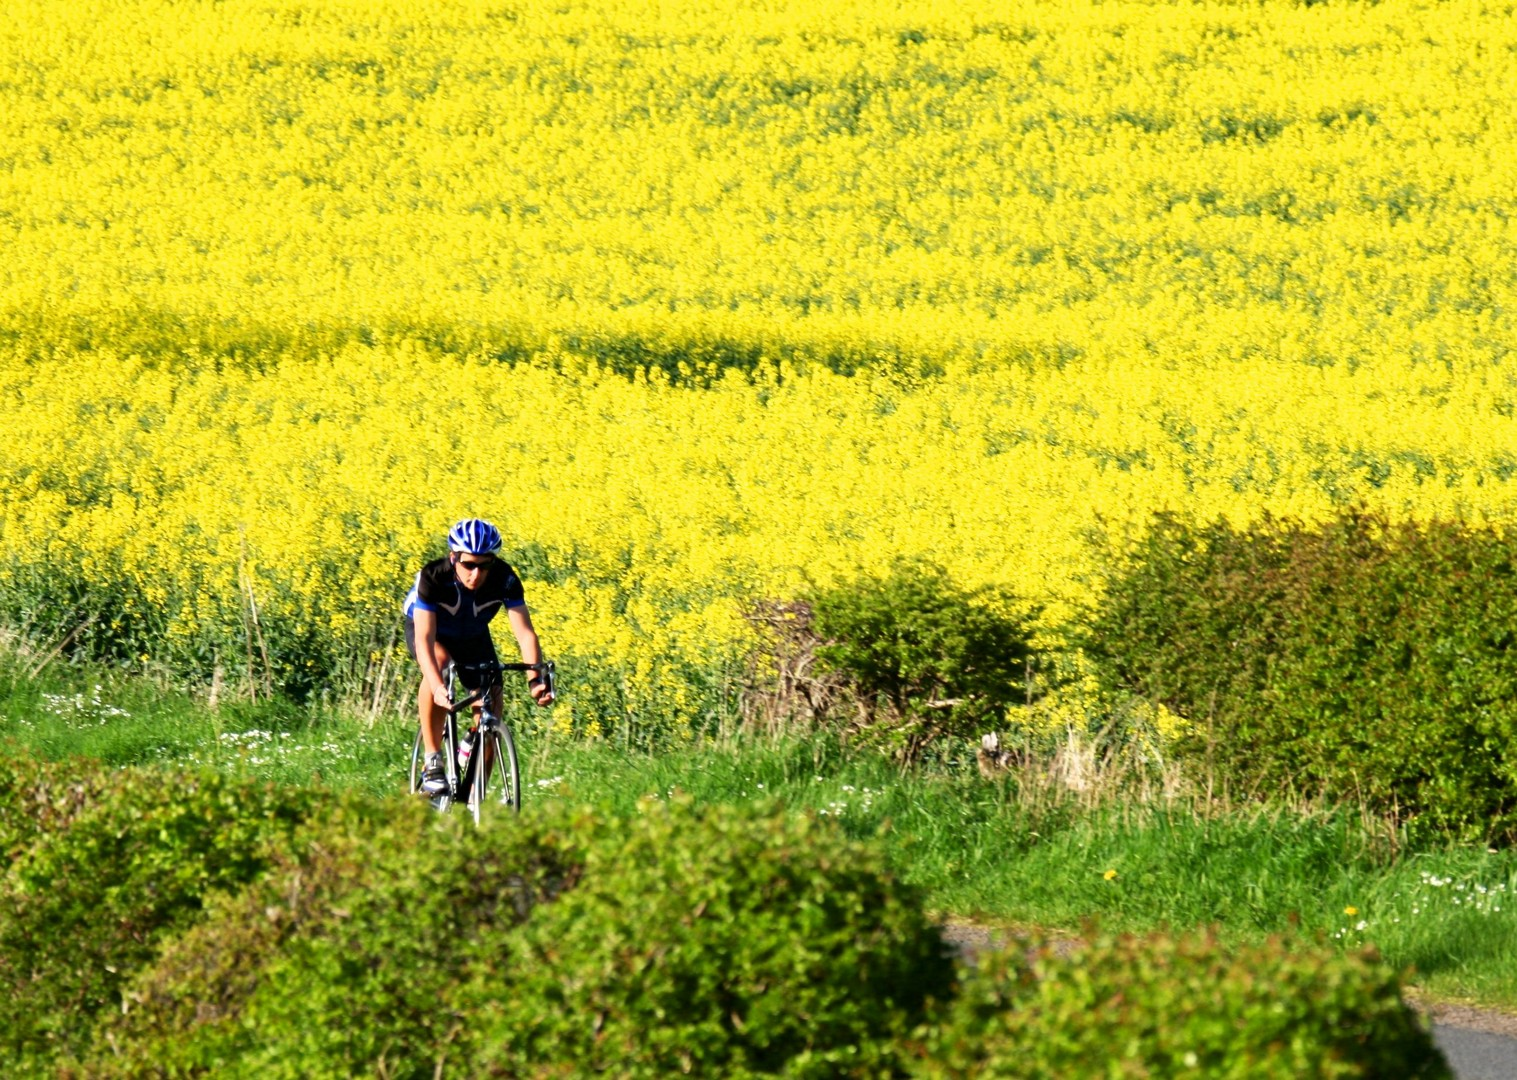 northumberland-guided-road-cycling.jpg - UK - Northumberland - Road Cycling